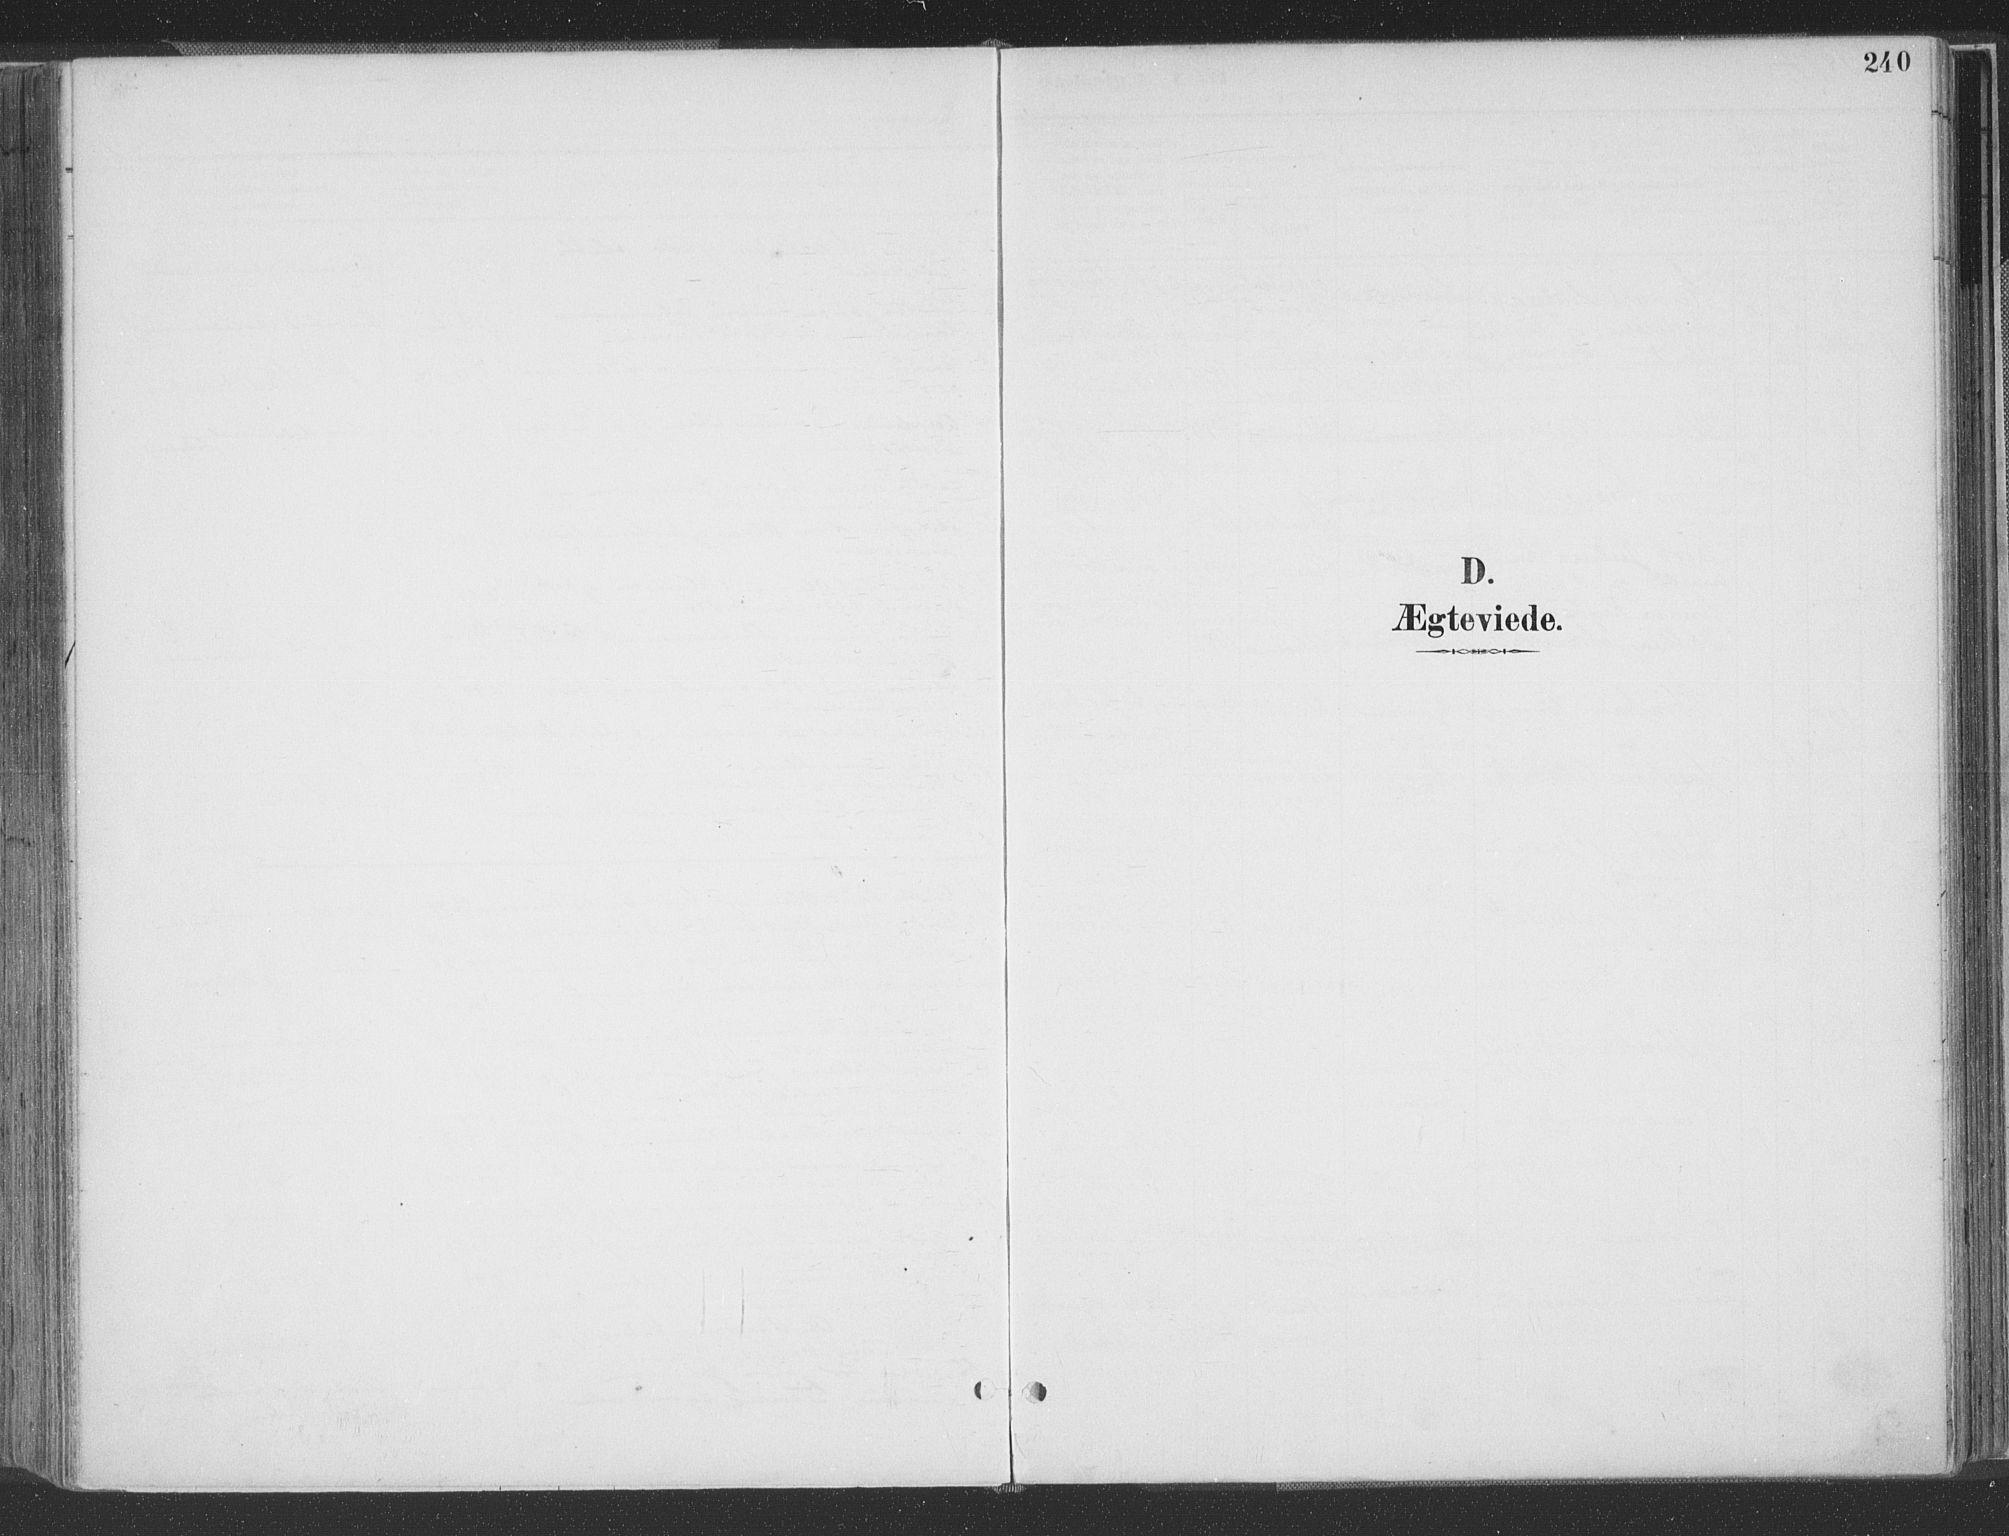 SAK, Høvåg sokneprestkontor, F/Fa/L0006: Ministerialbok nr. A 6, 1894-1923, s. 240